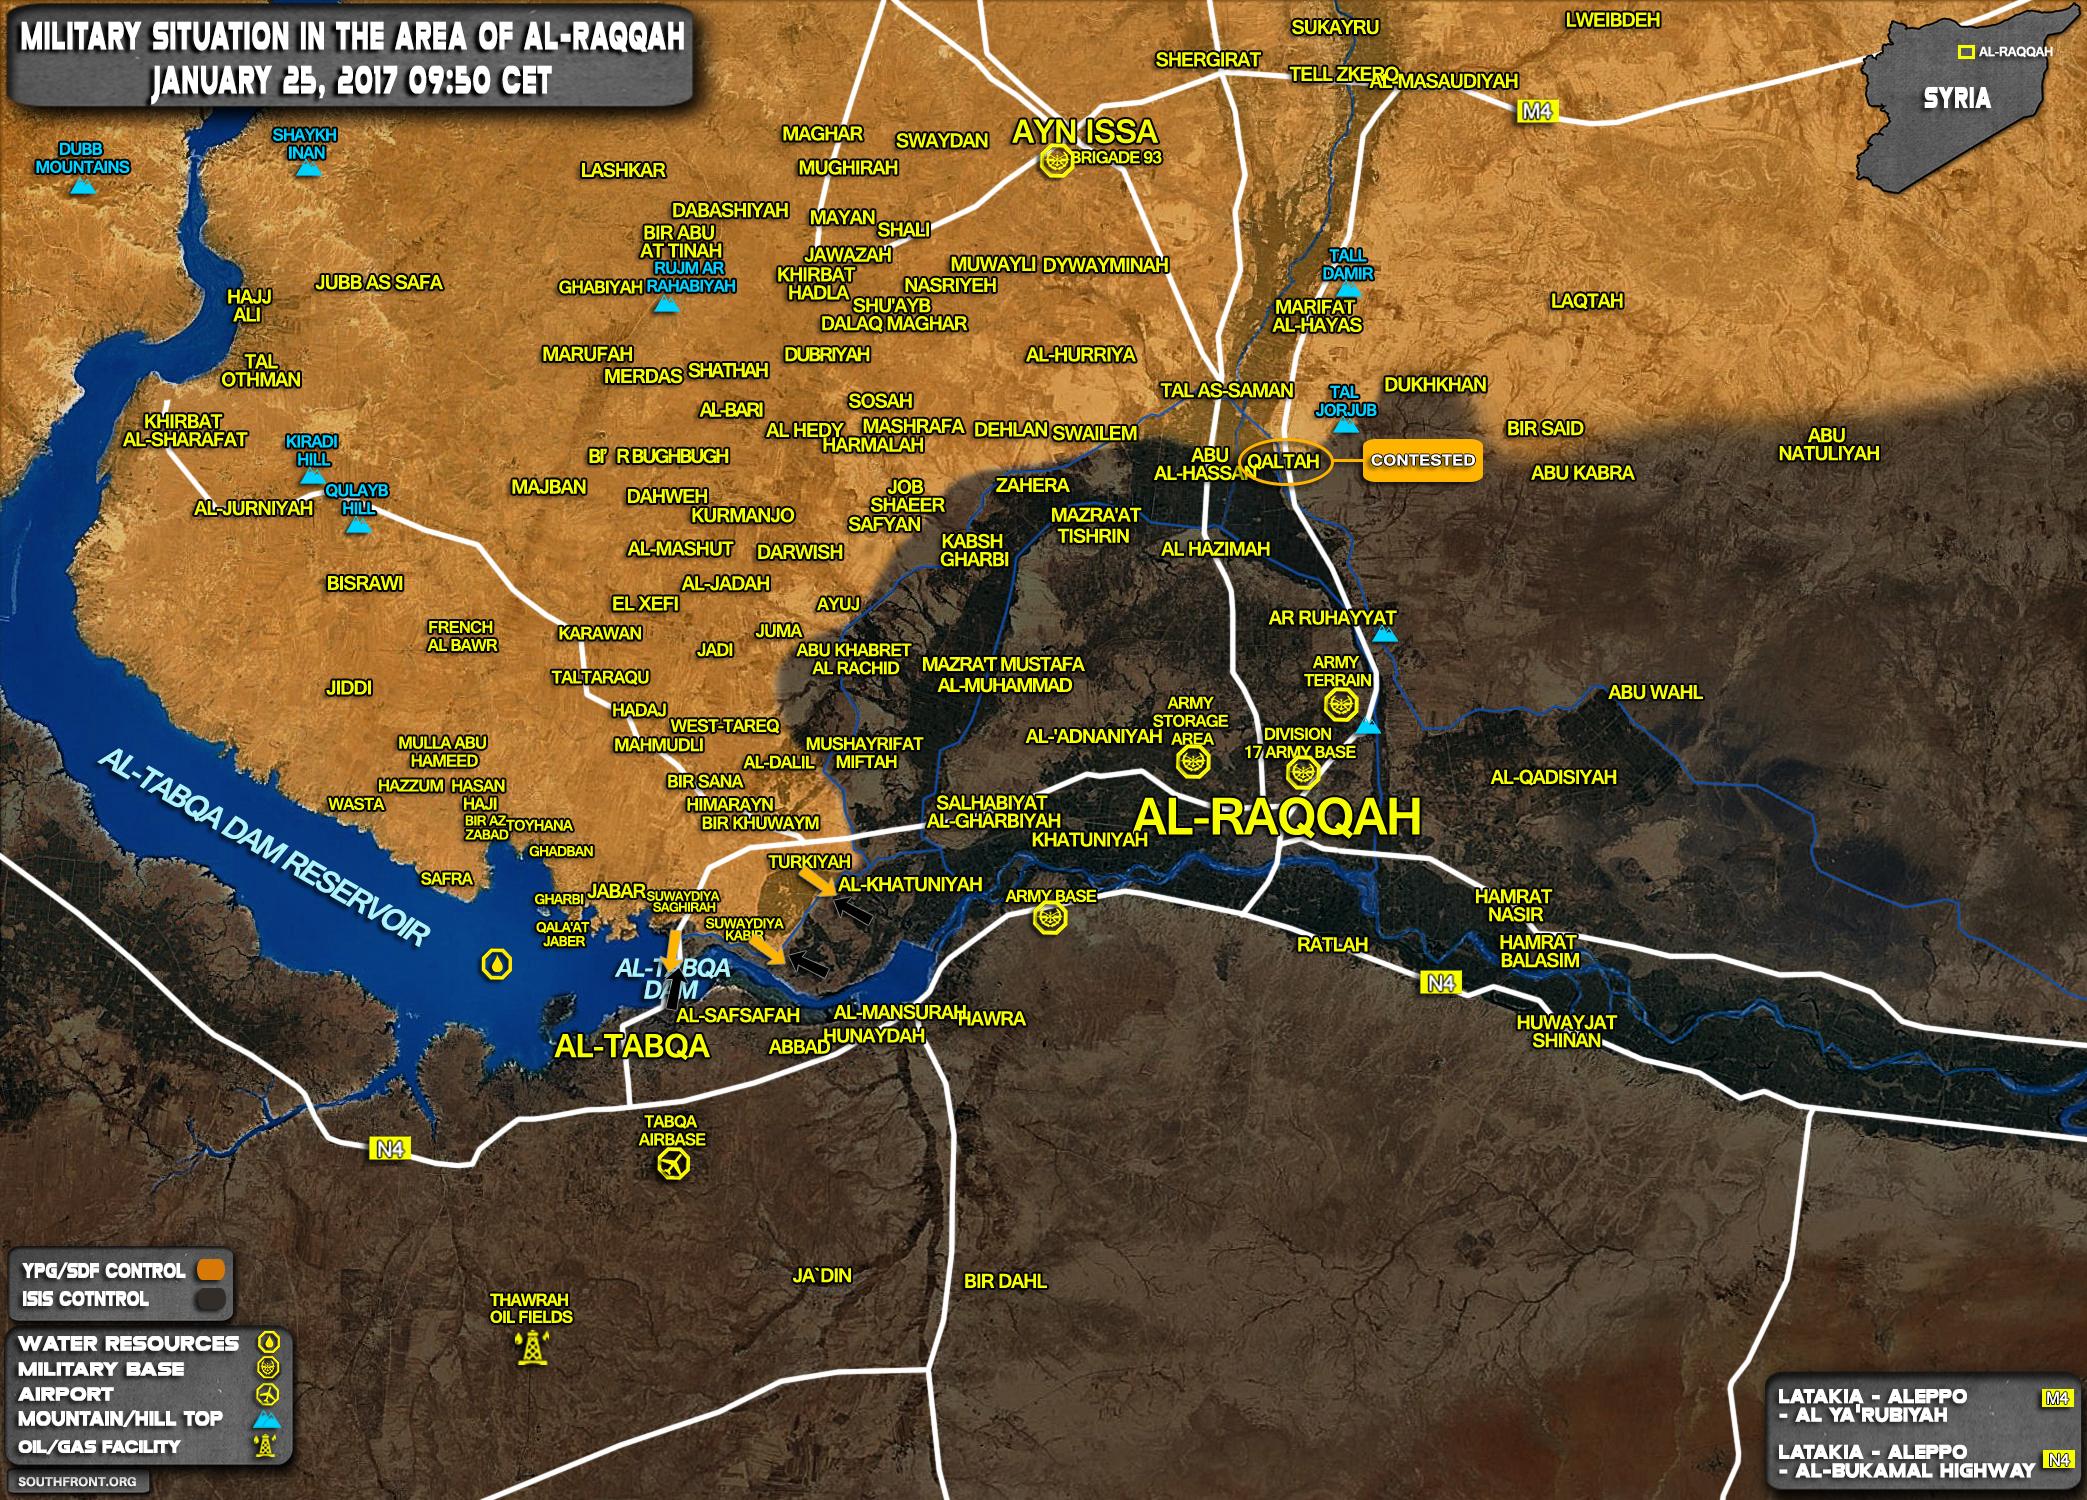 24Jan_Al-Raqqah_Syria_War_Map.jpg